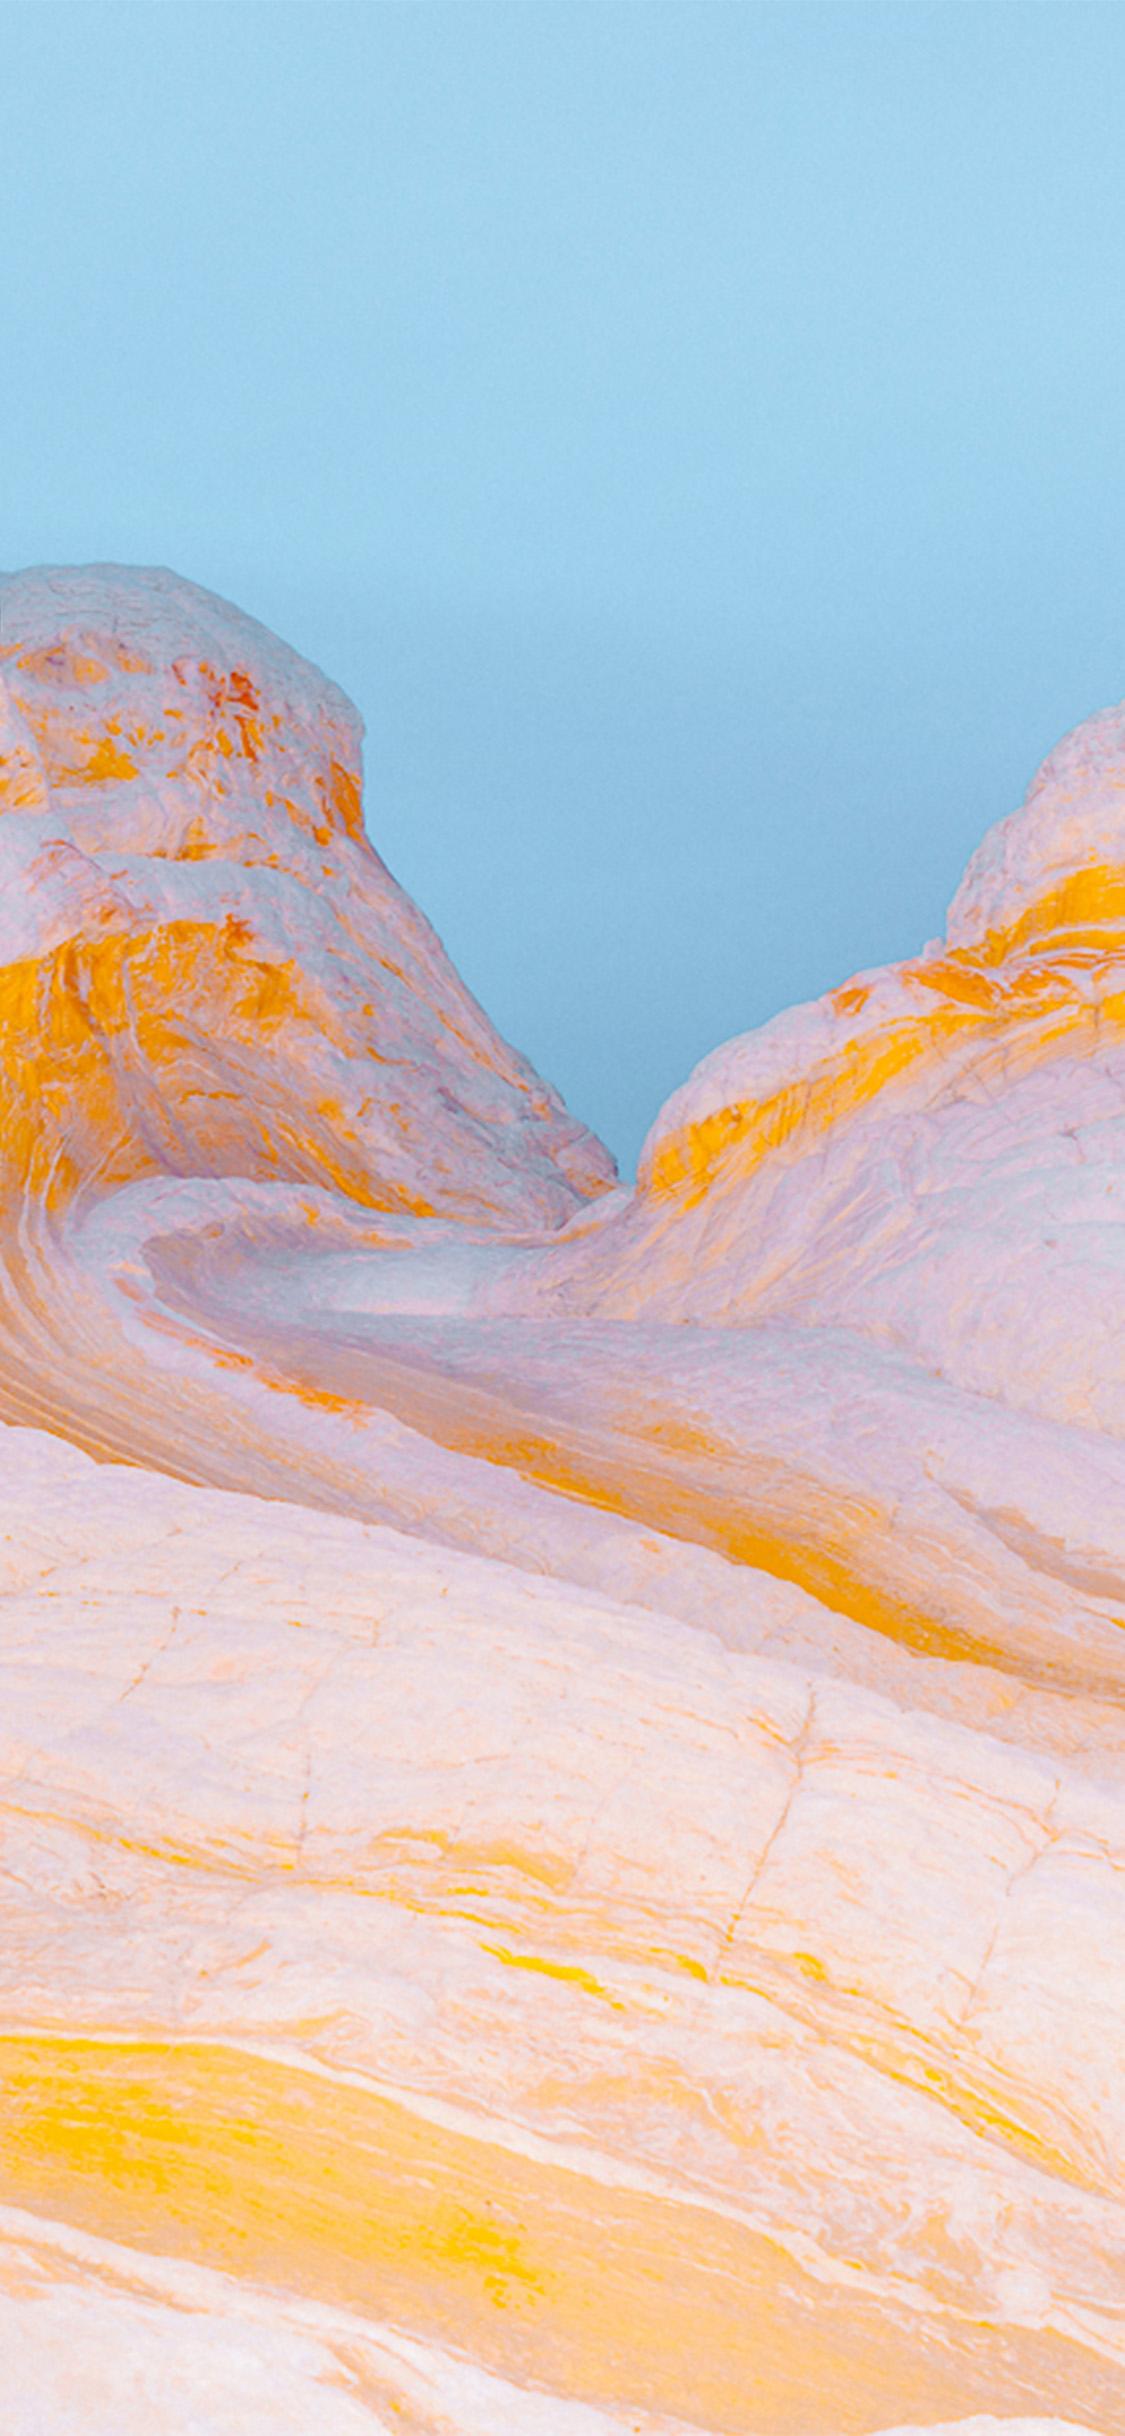 Iphonexpapers Com Iphone X Wallpaper Vz29 Mountain Yellow Weird Pattern Background